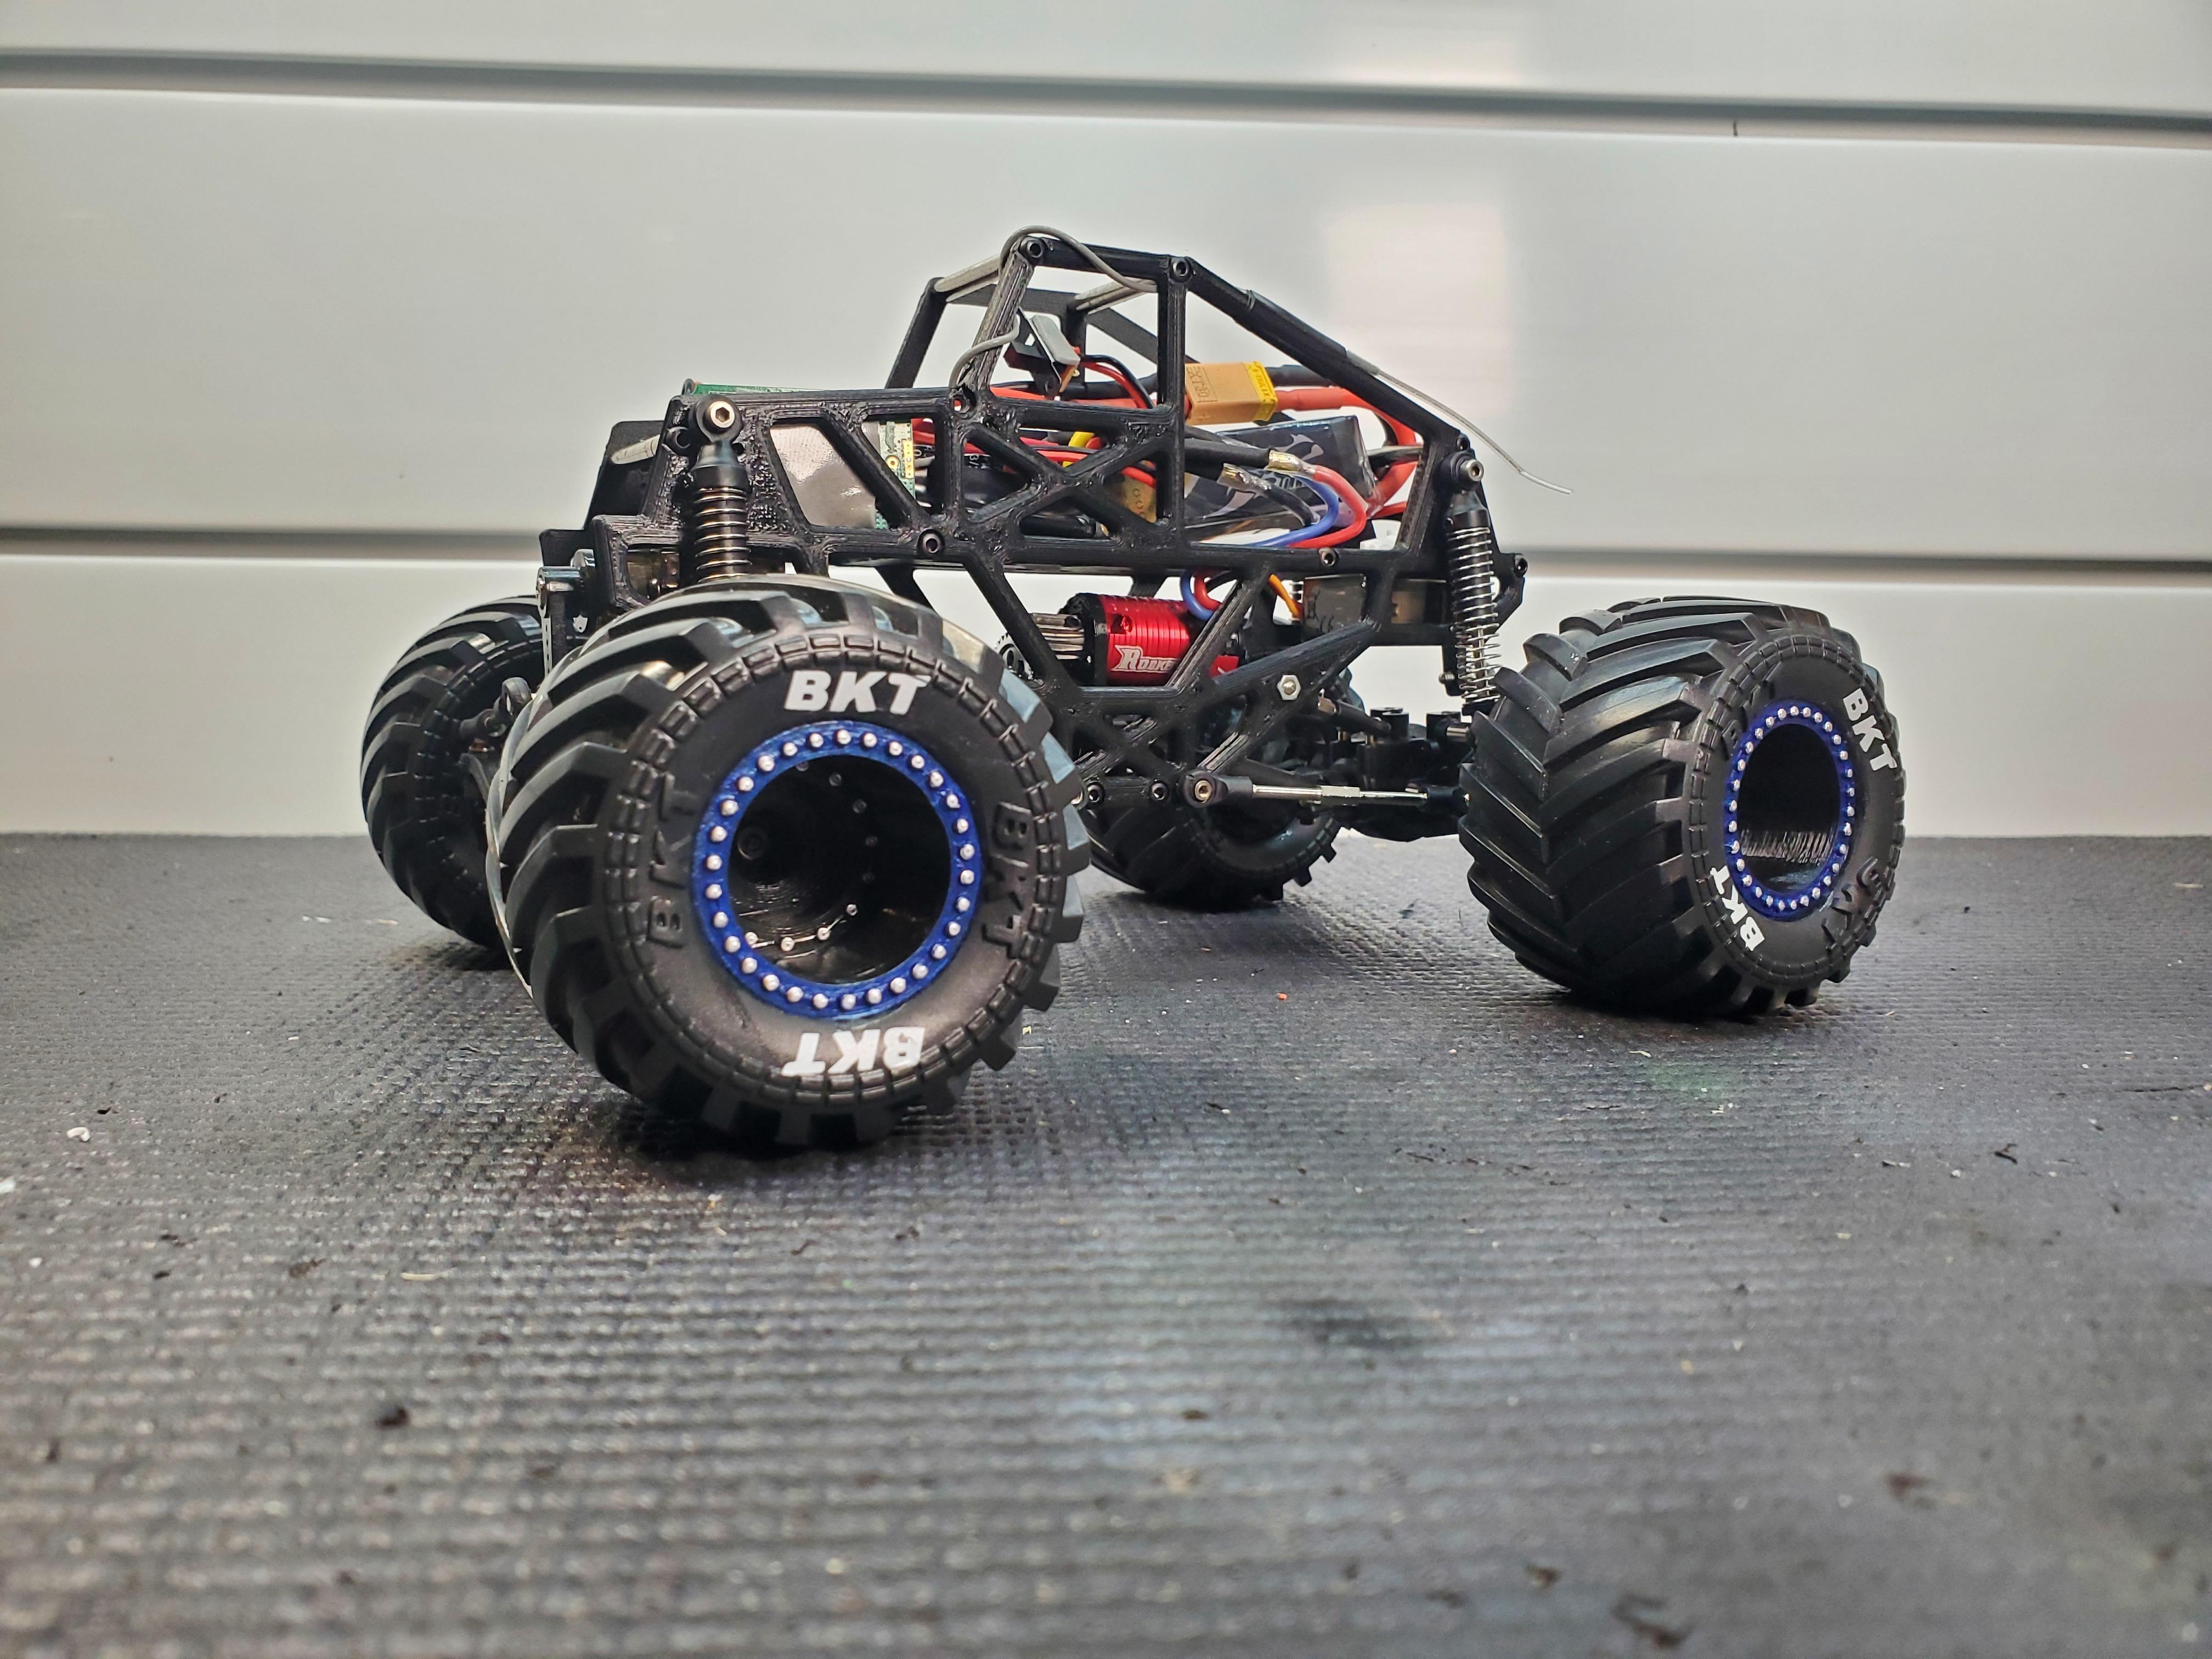 20200927_084404.jpg Download STL file Micro RC Solid Axle Monster Truck  • 3D printable template, FullThrottleRC